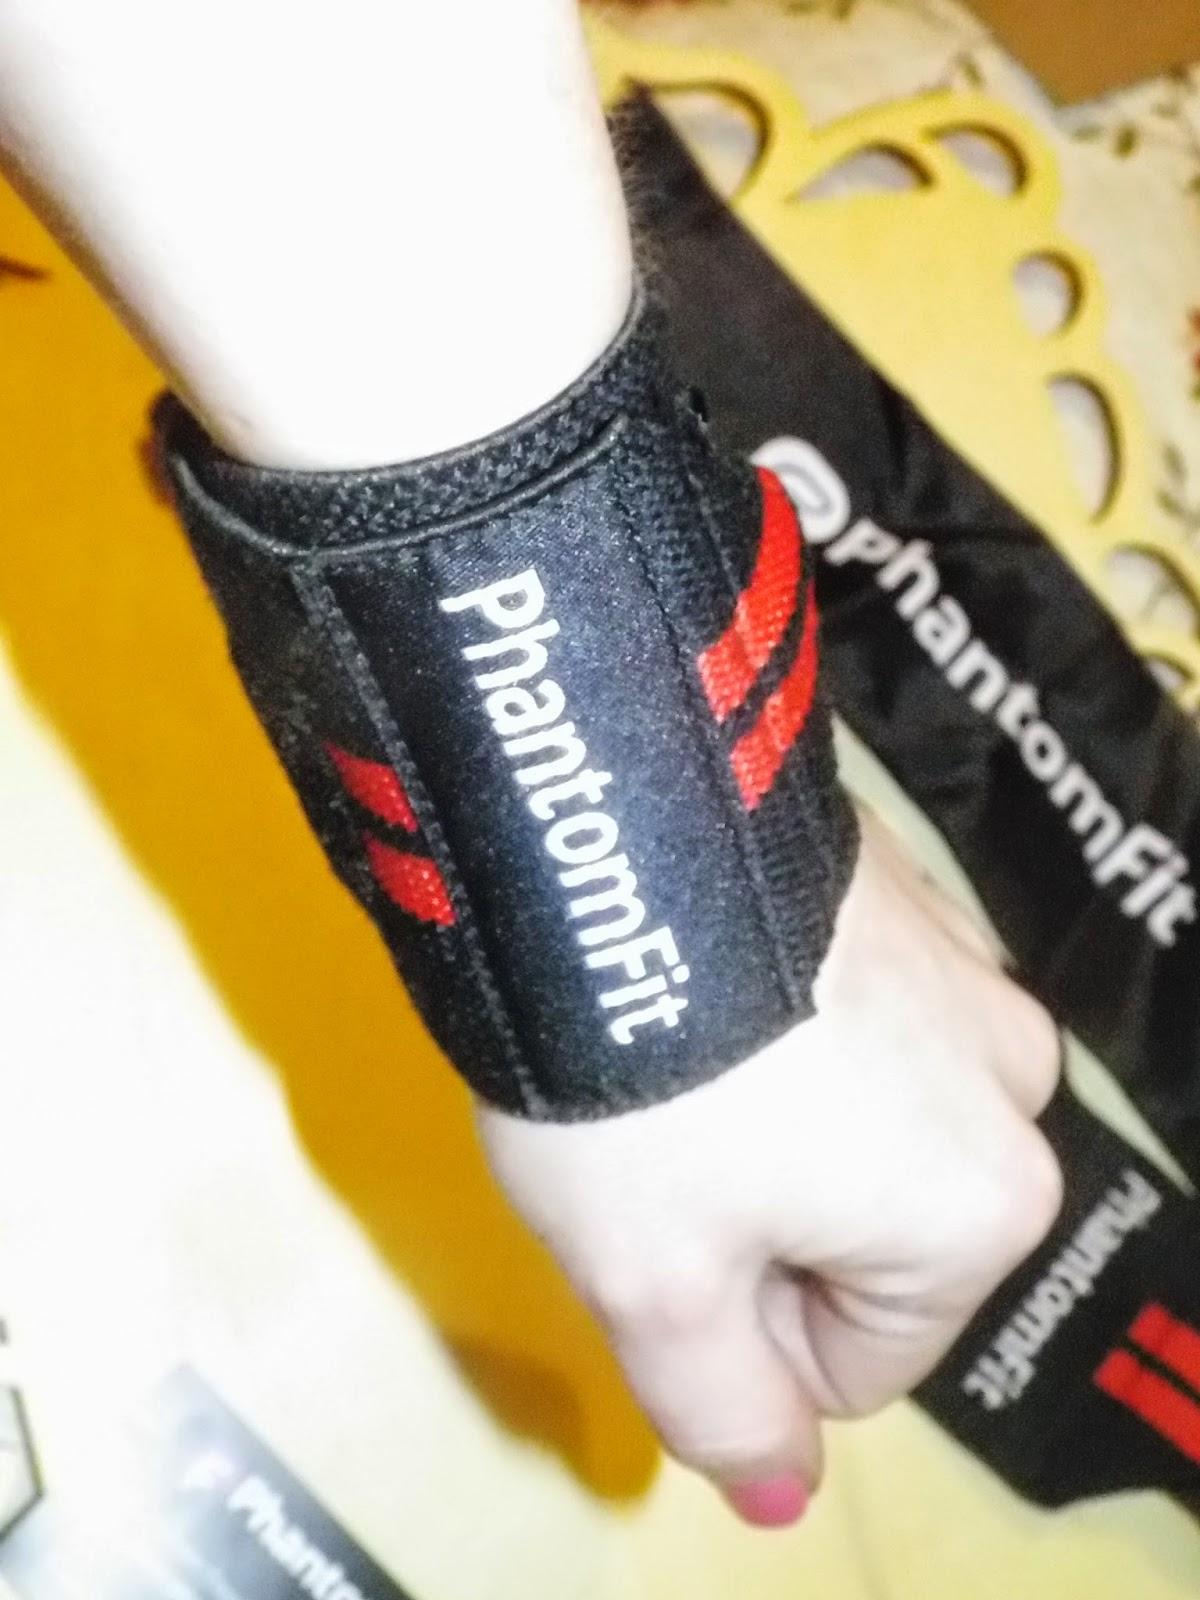 PhantomFit wristband